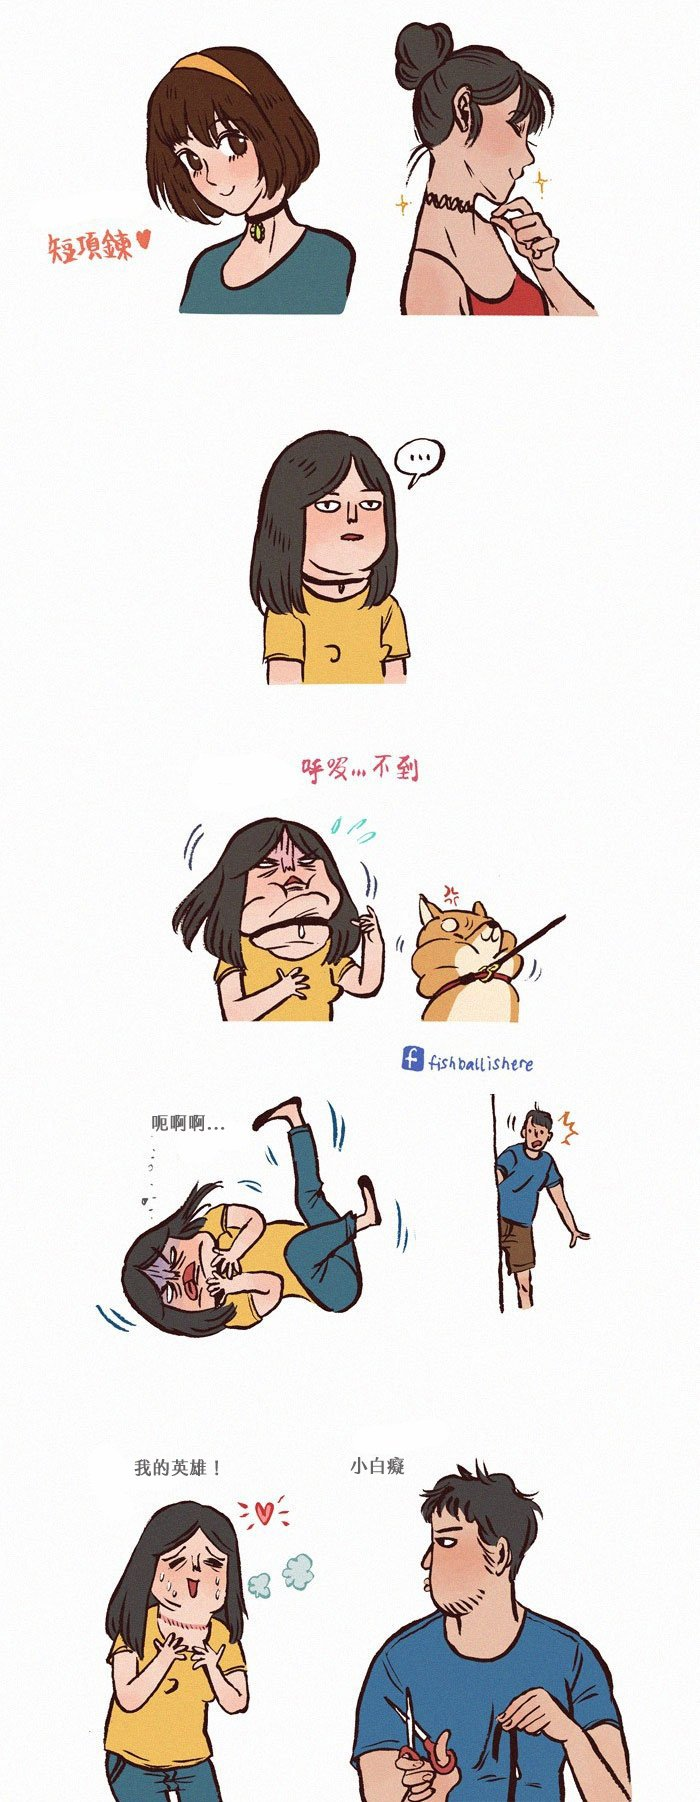 lovely-webtoons-when-you-love_my-giant-nerd-boyfriend-comics-fishball-24%e6%8b%b7%e8%b2%9d